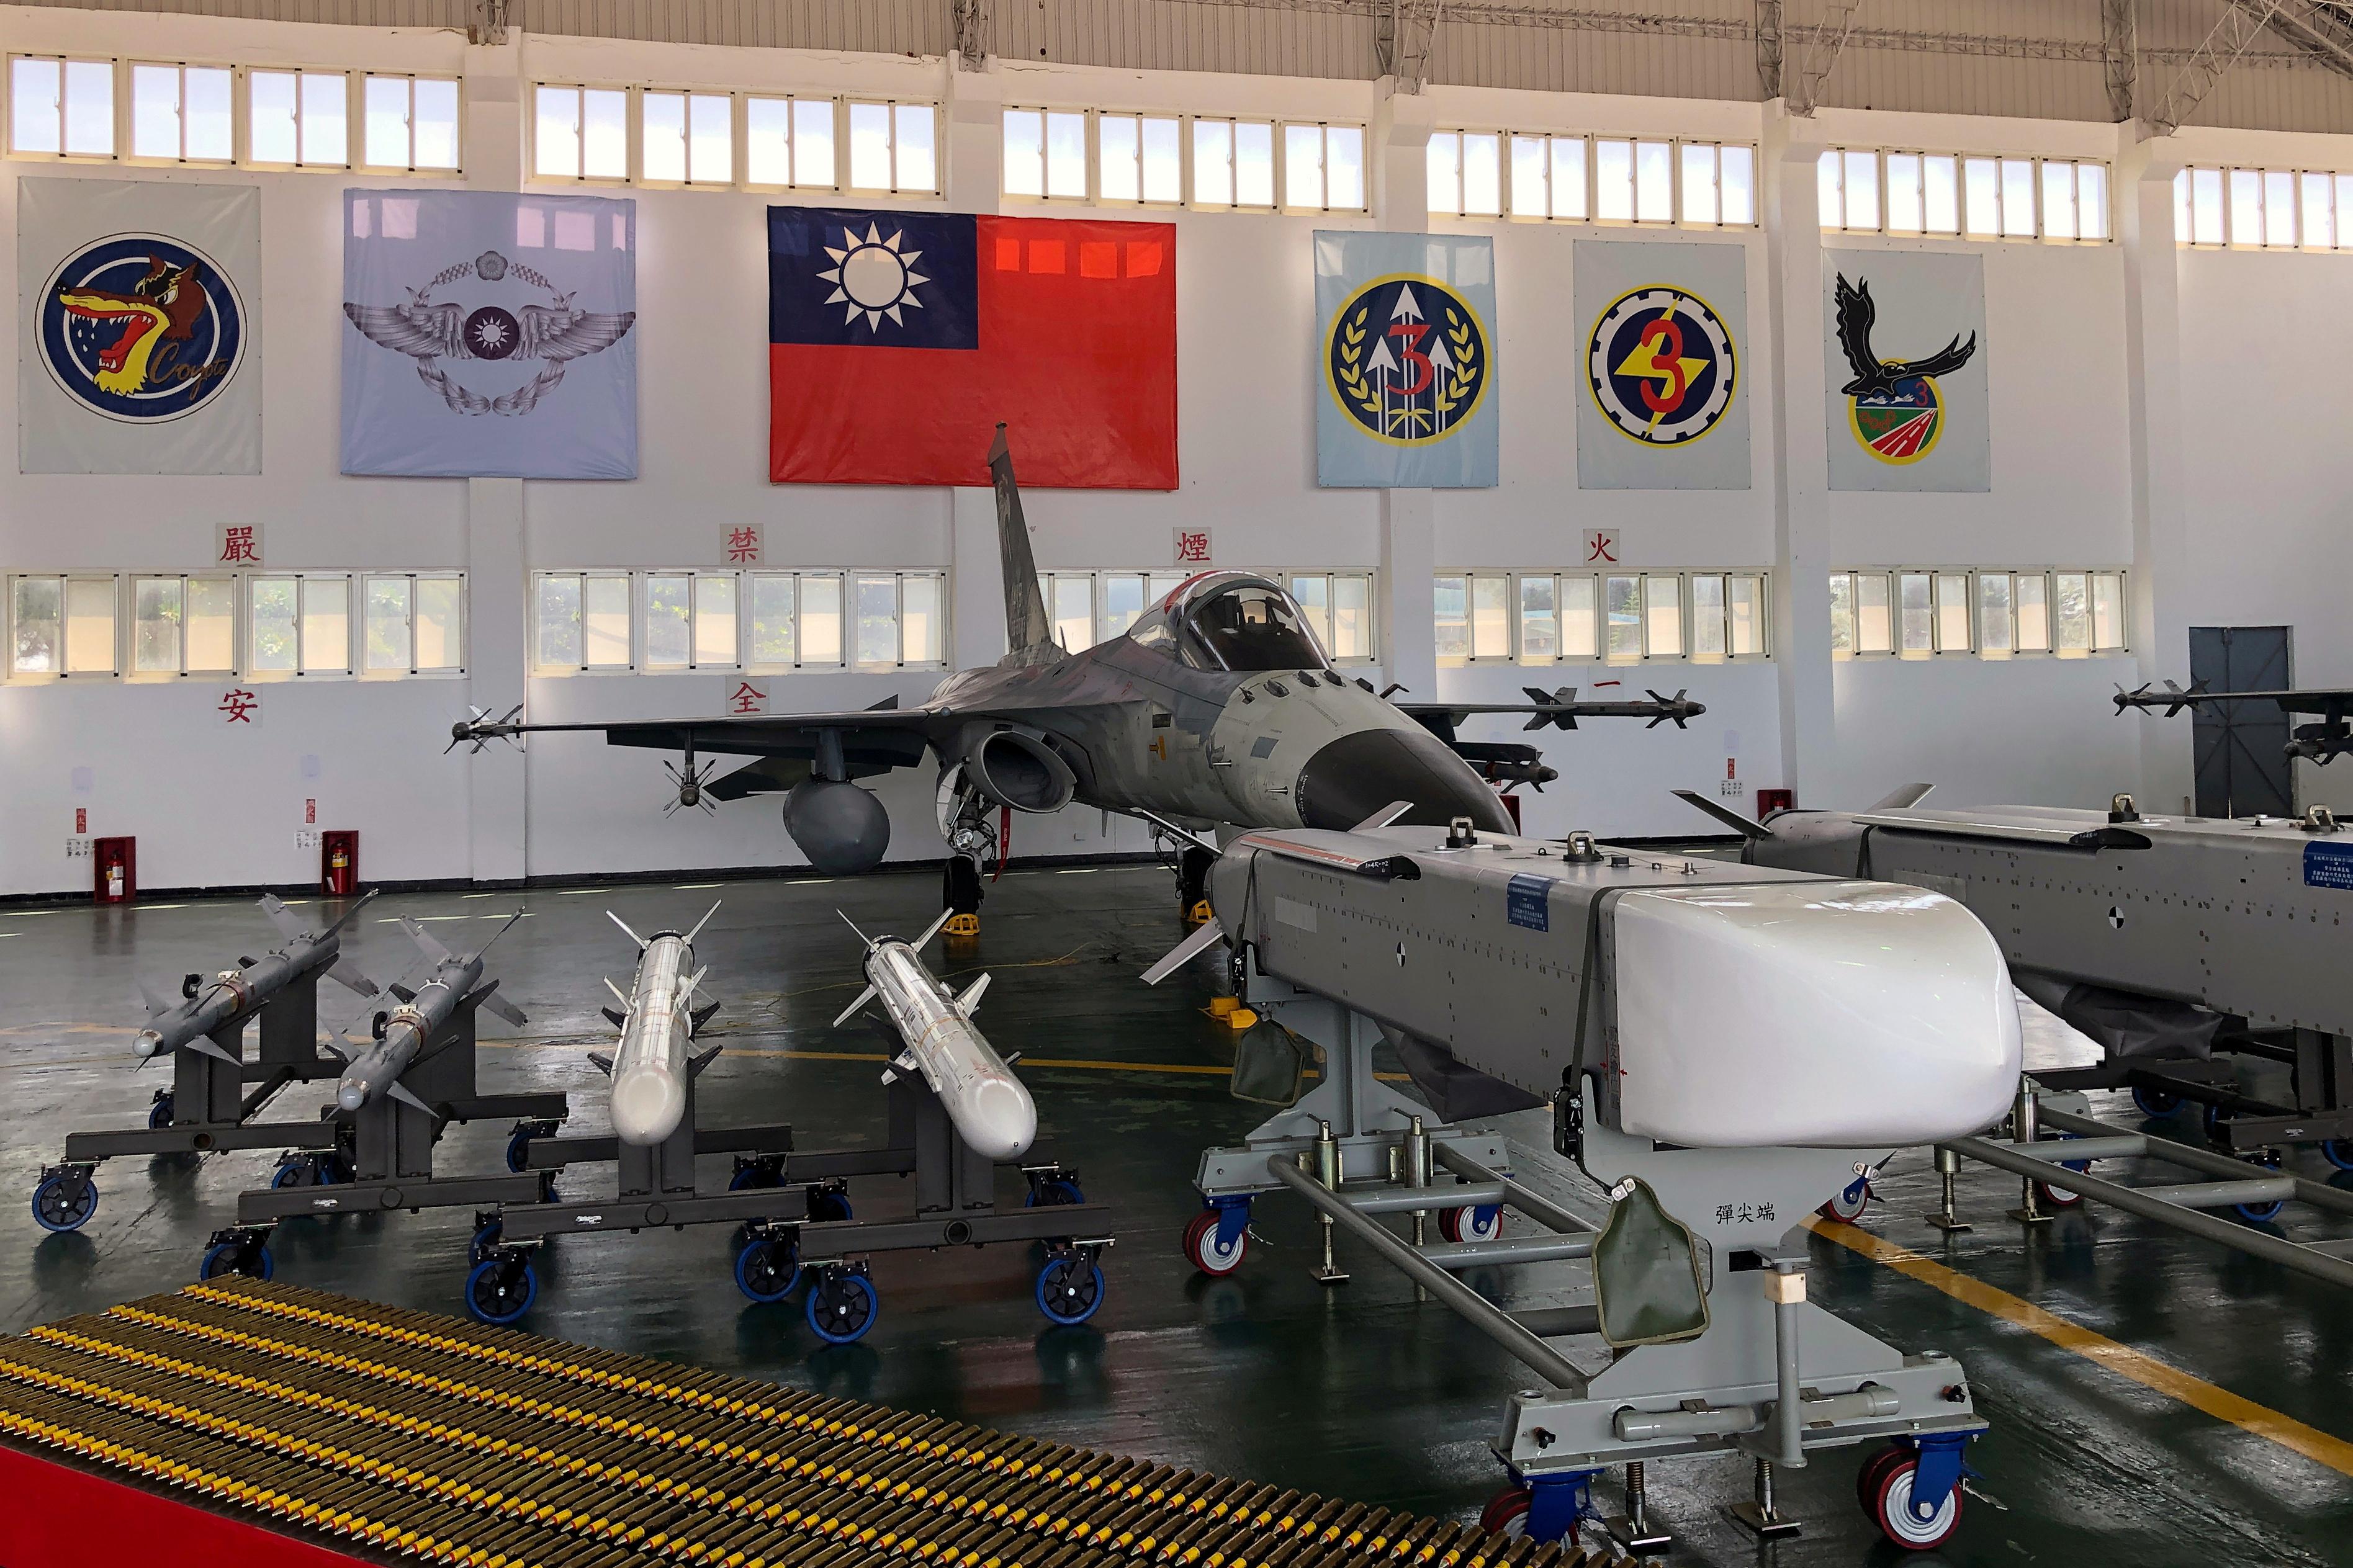 En urbane stråle og missiler for urfolksforsvar (IDF) blir sett på Makung Air Force Base på Taiwans offshore-øy Penghu, 22. september 2020. REUTERS / Yimou Lee